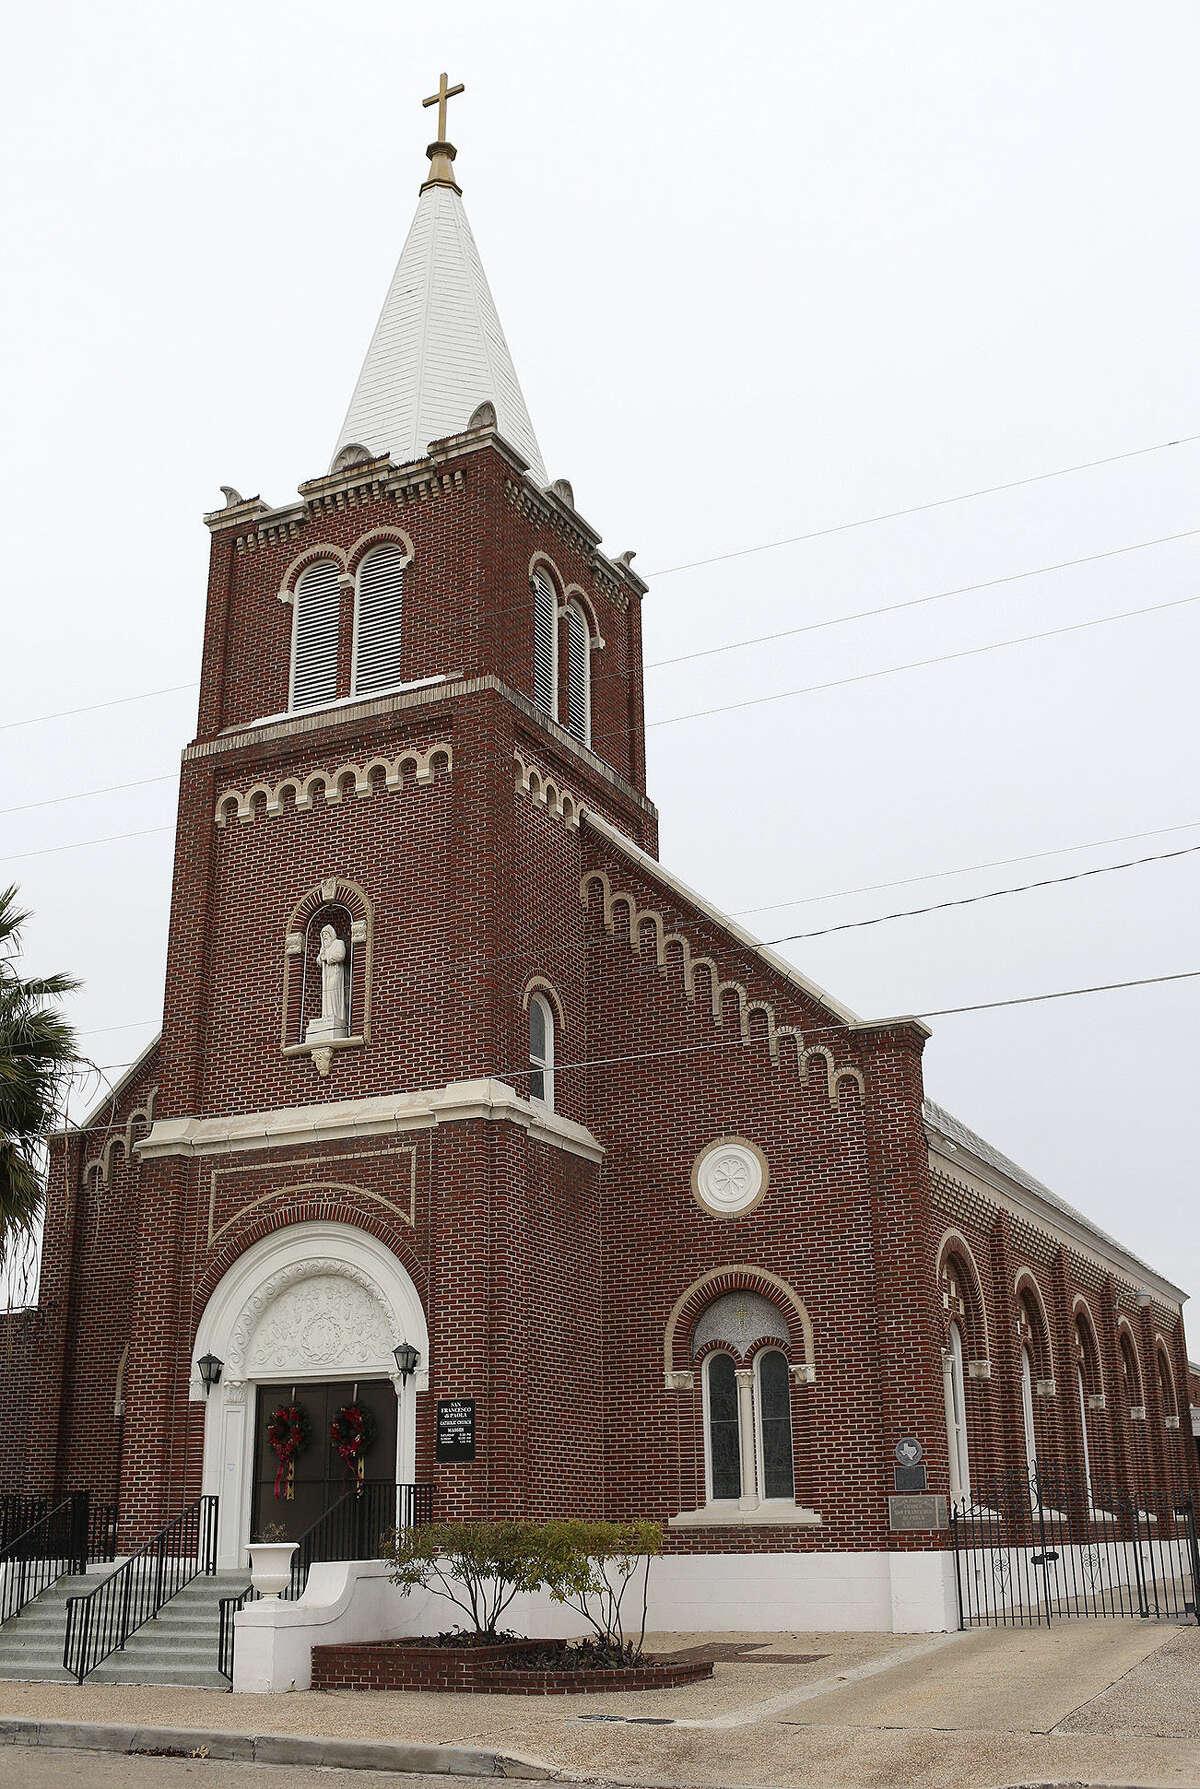 The Romanesque-style San Francesco di Paola Catholic Church was built in 1927 for the city's Italian Catholics.